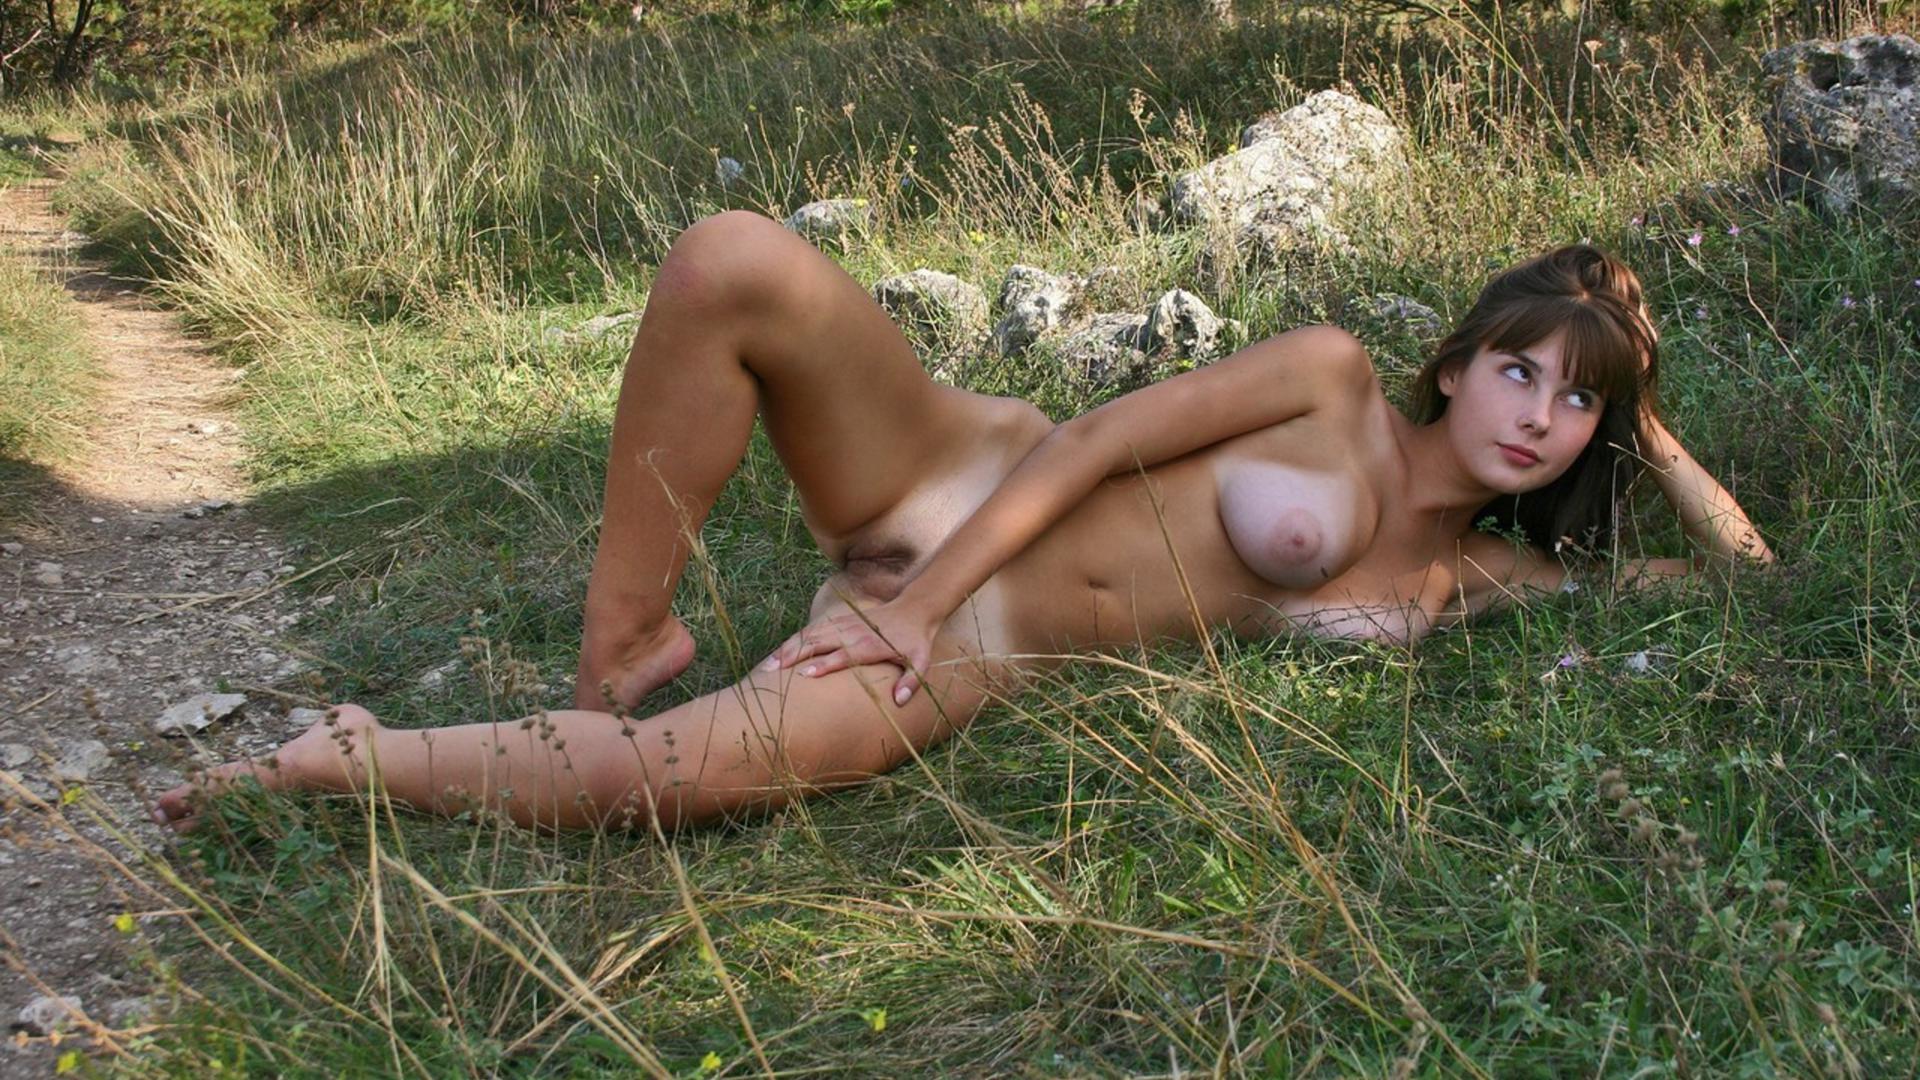 Emma stansfield nude